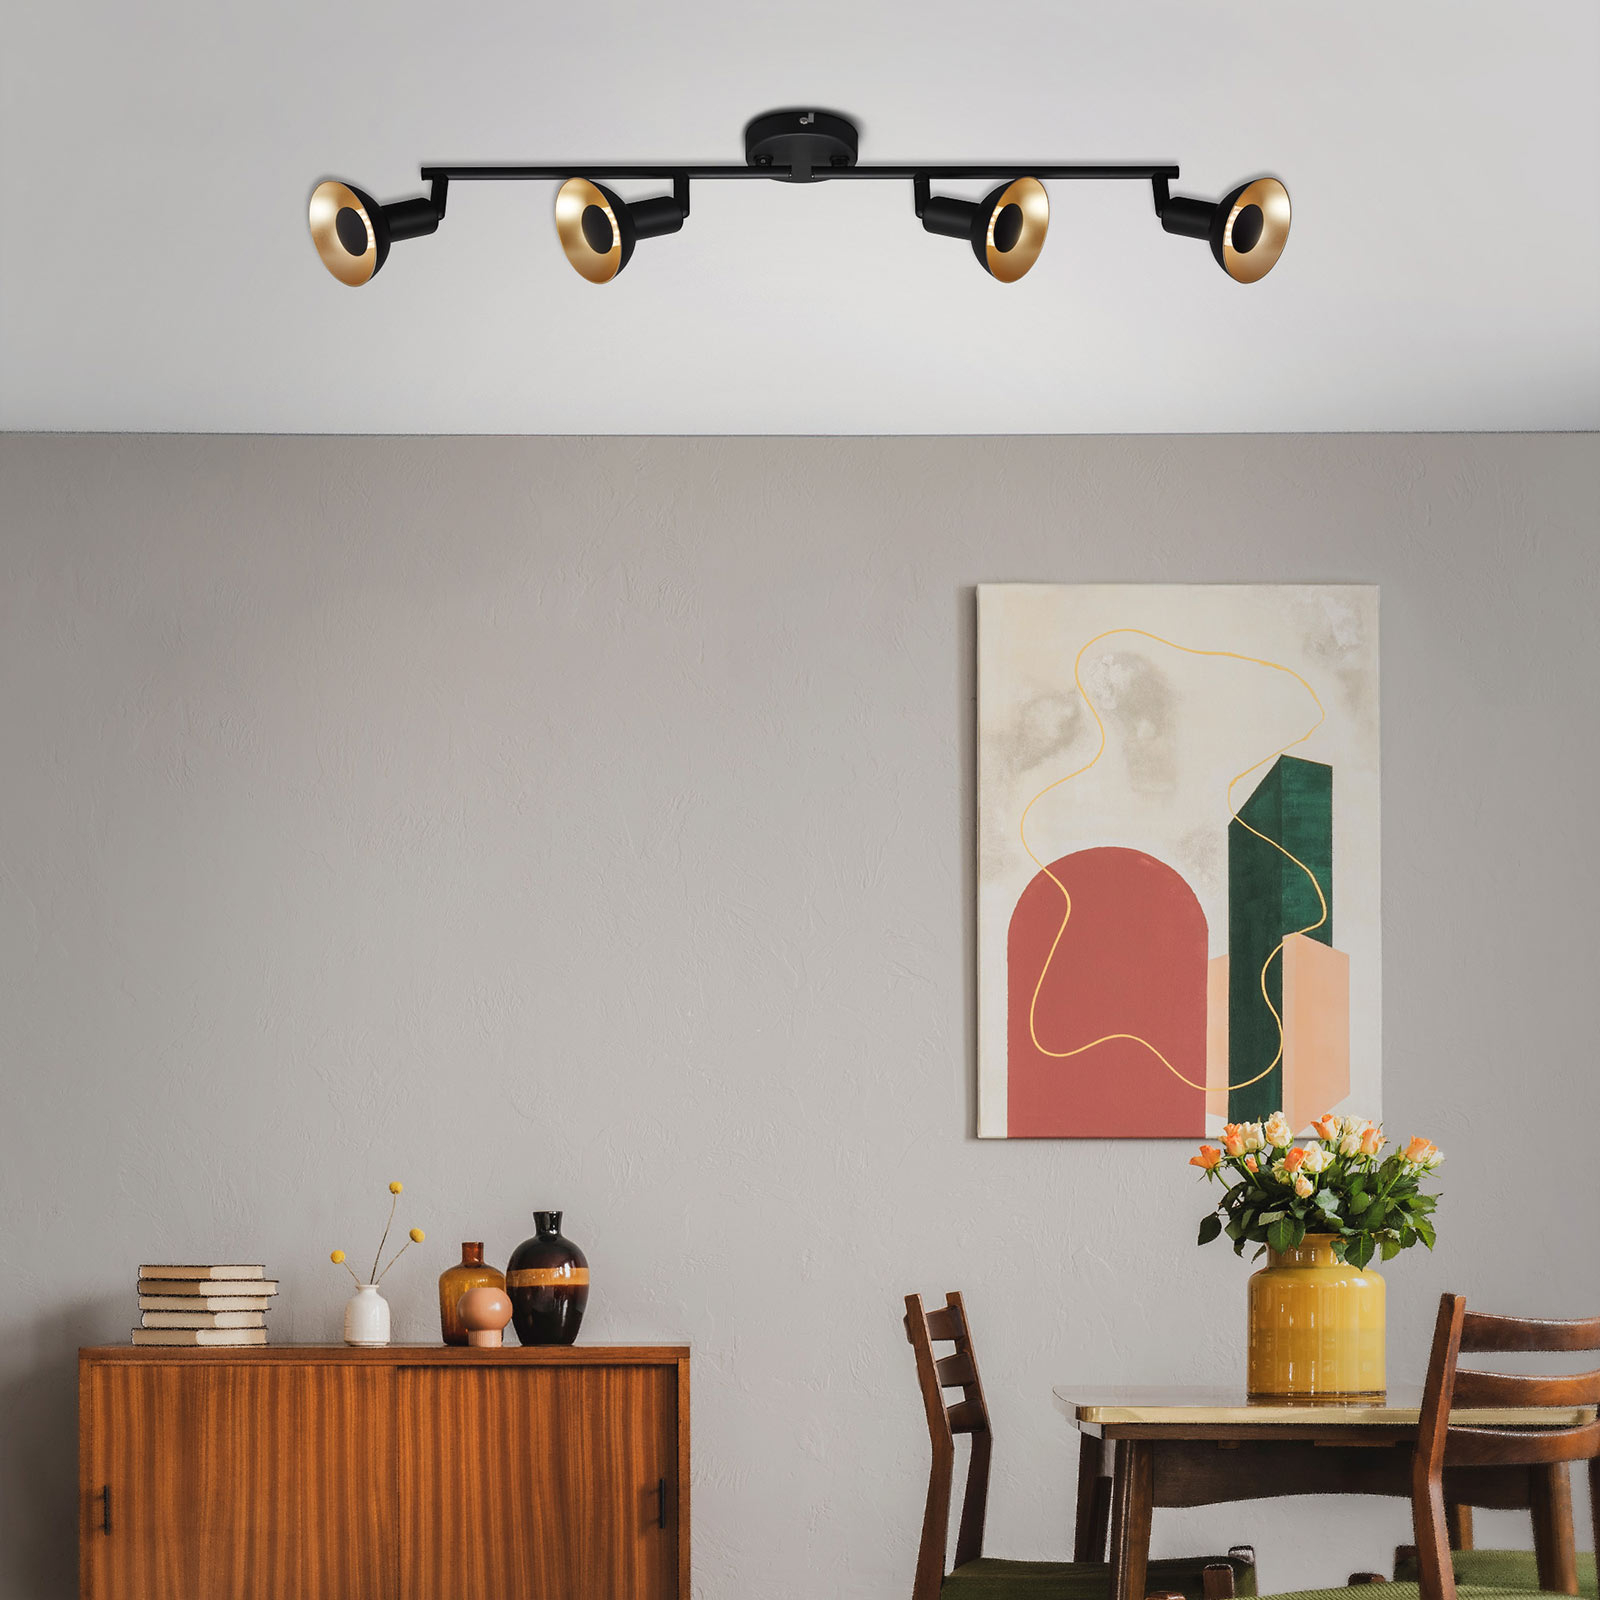 LED plafondlamp Kukui, 4-lamps